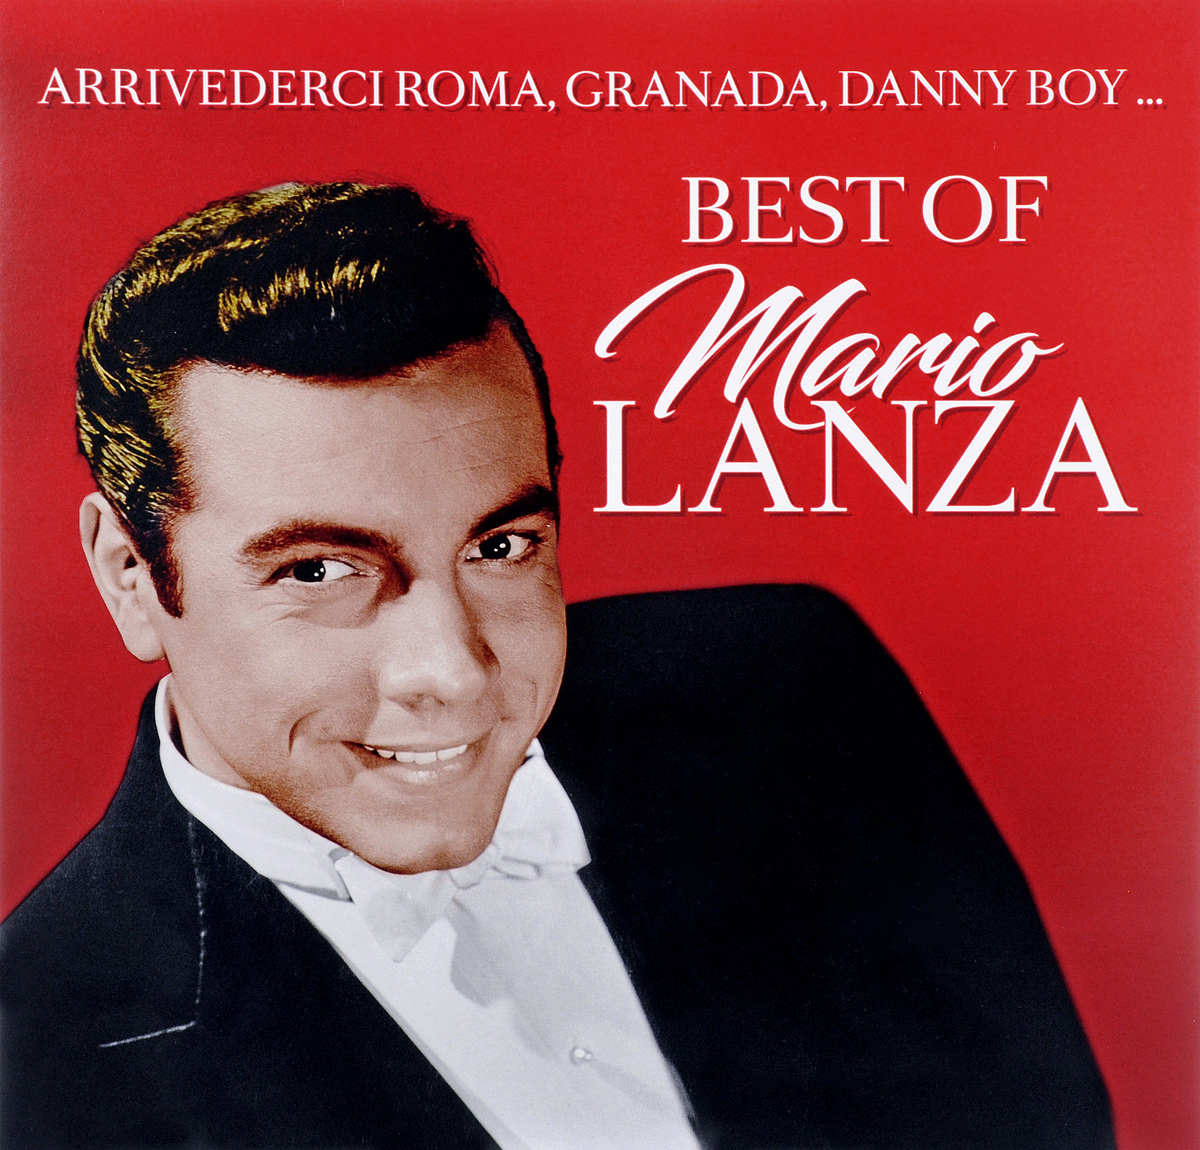 Марио Ланца Mario Lanza. The Best of Mario Lanza (LP) брюки 7 8 quelle b c best connections by heine 154161